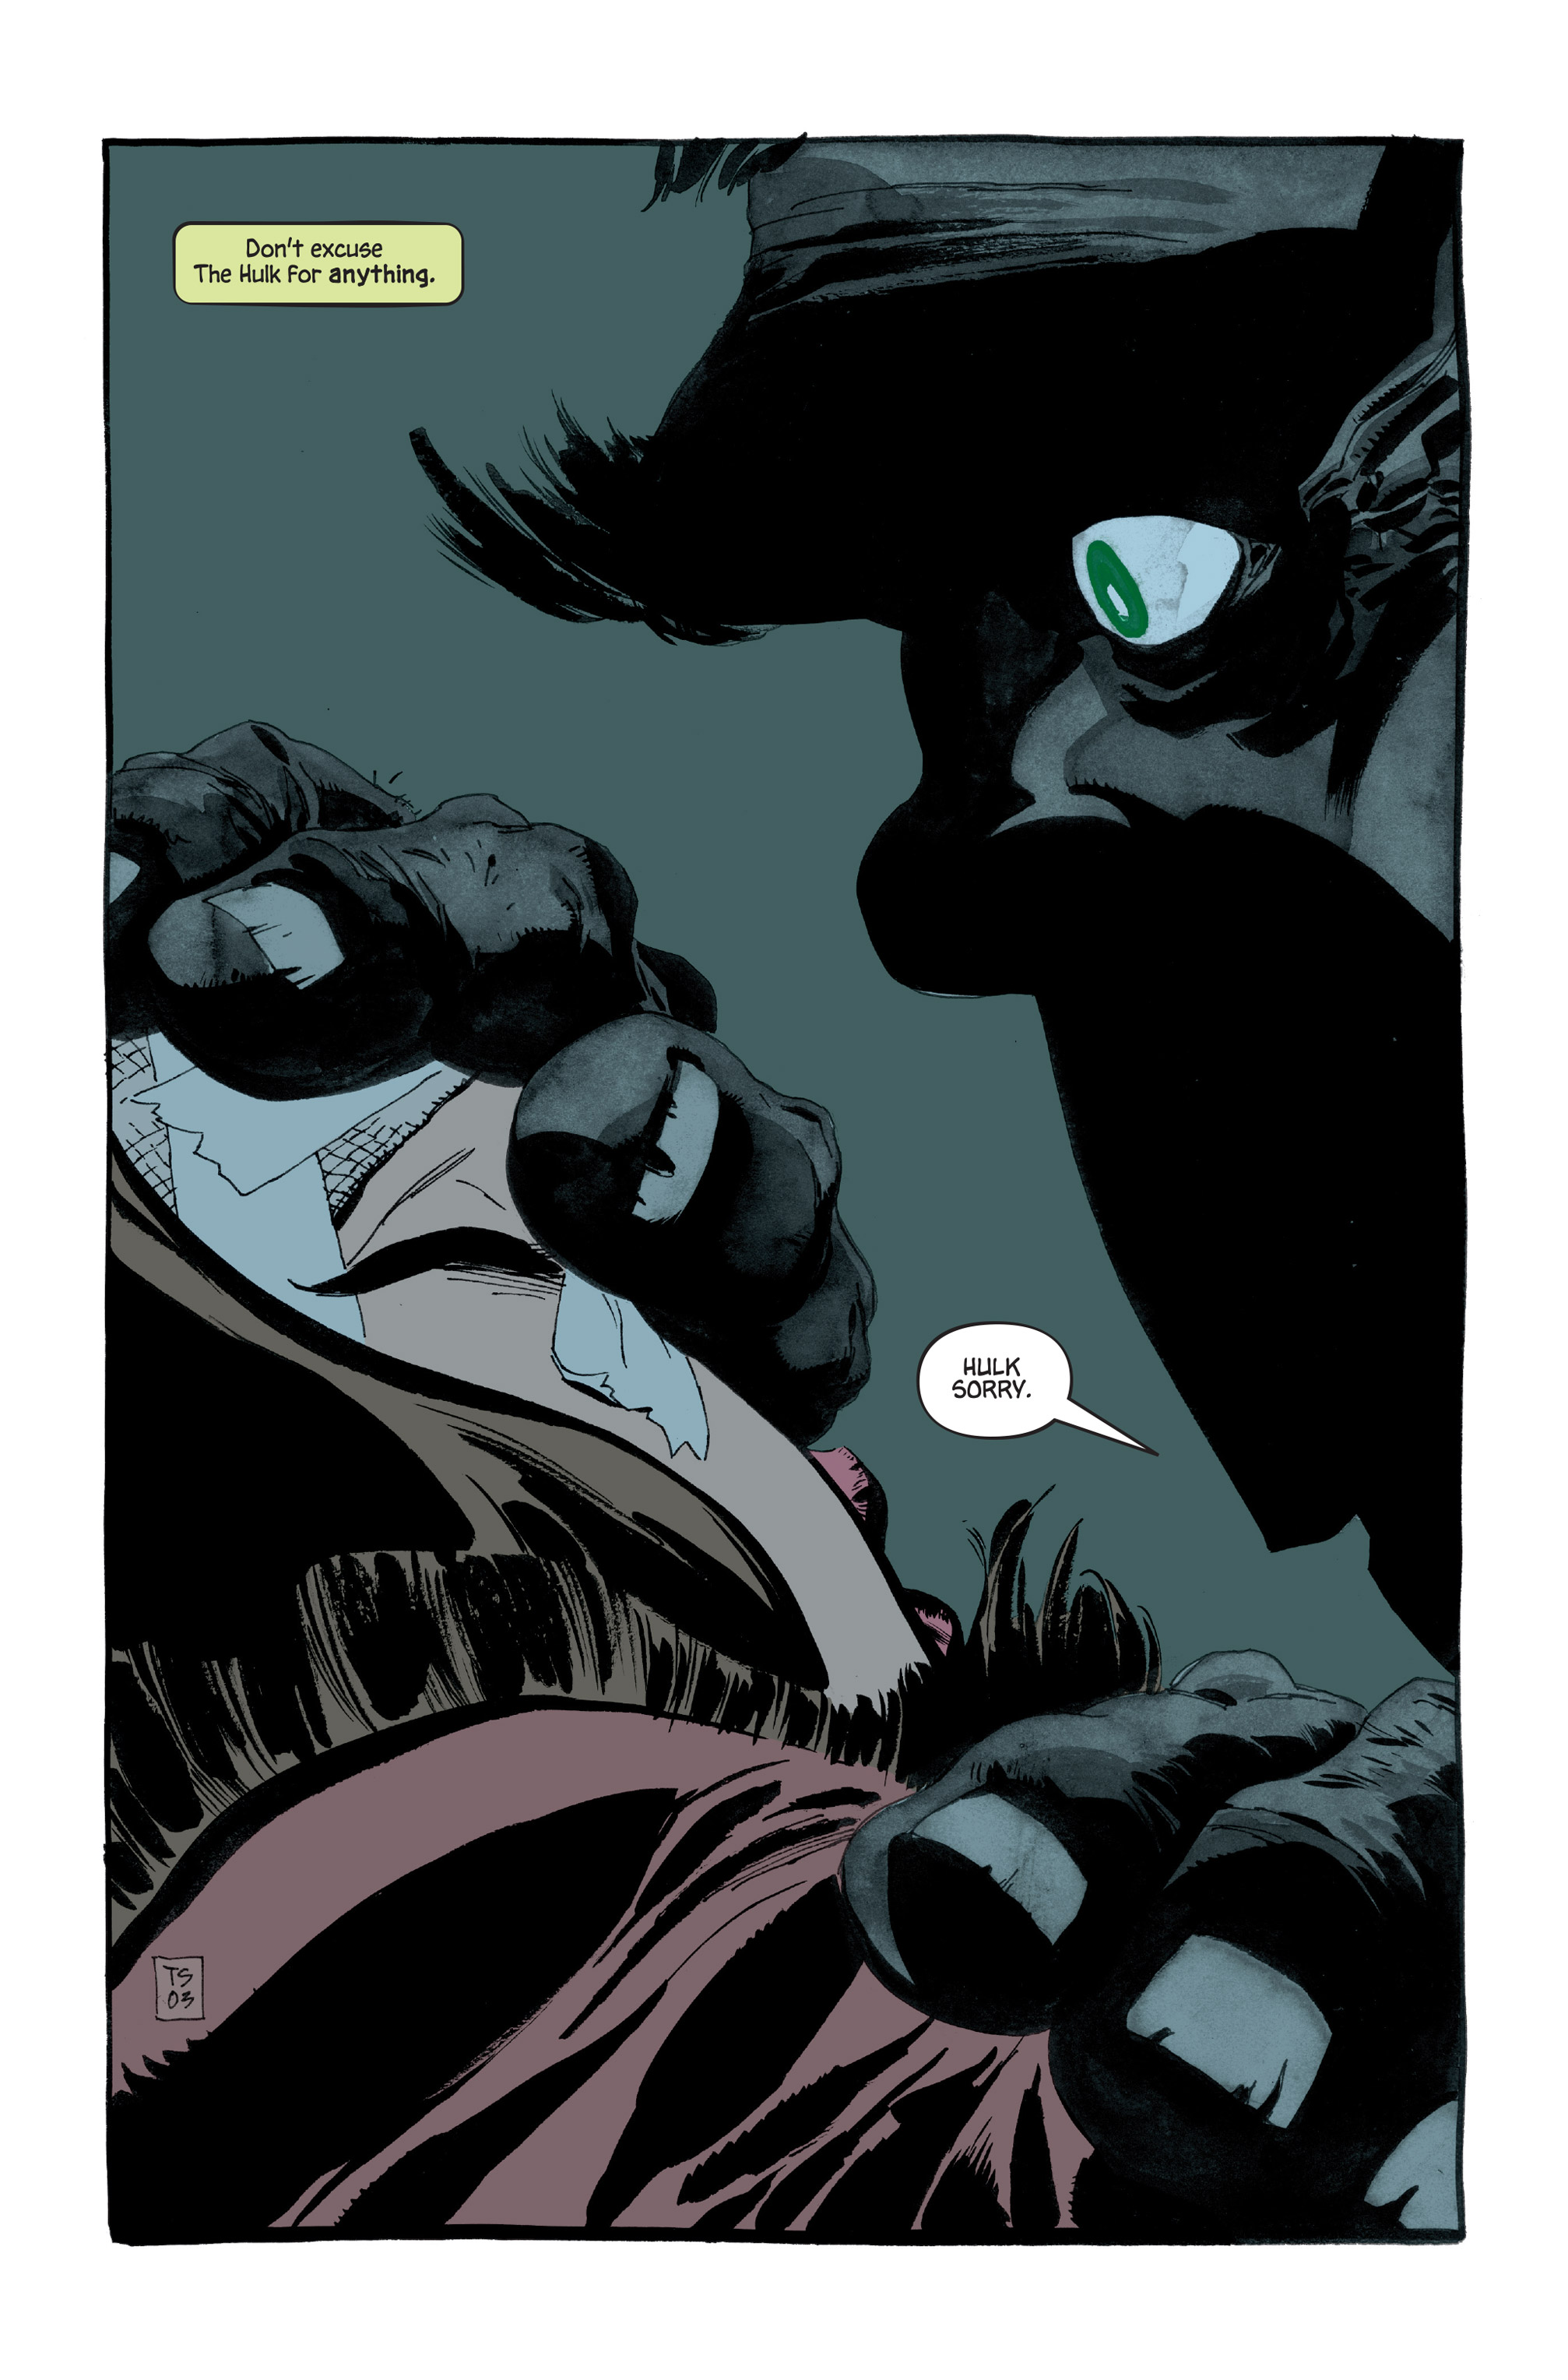 Read online Hulk: Gray comic -  Issue #5 - 7